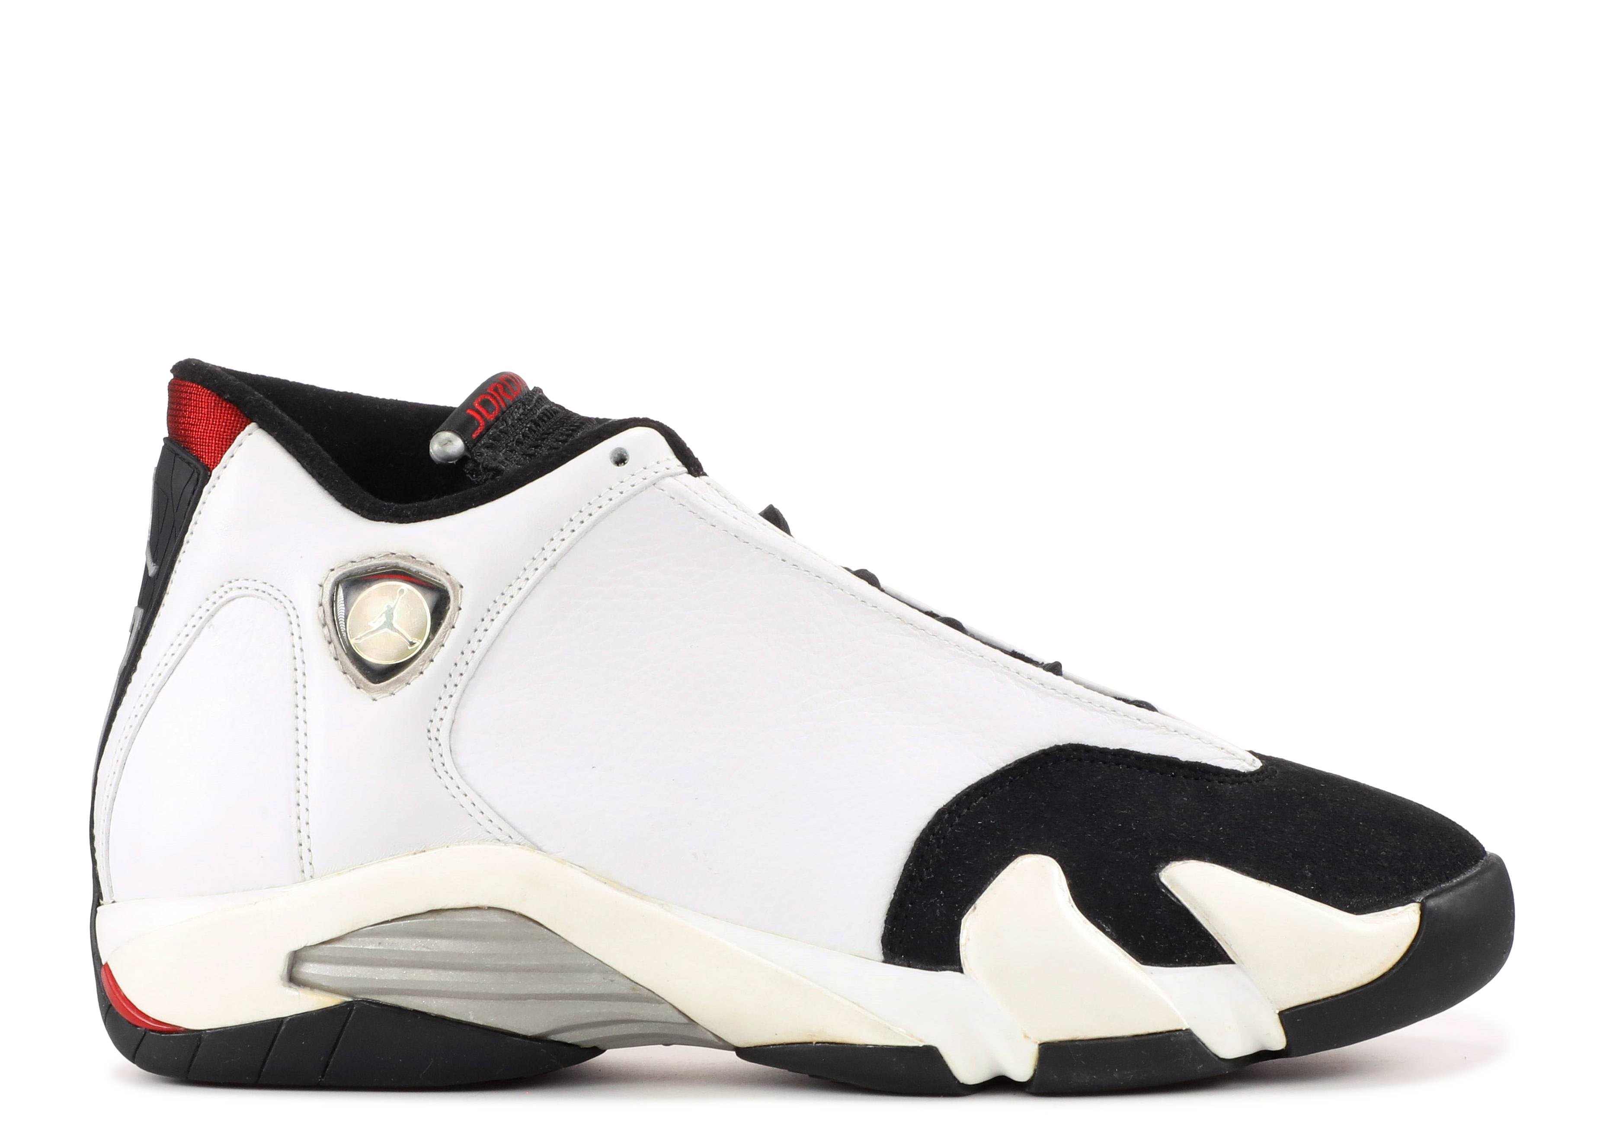 Air Jordan 14 OG 'Black Toe' 1998